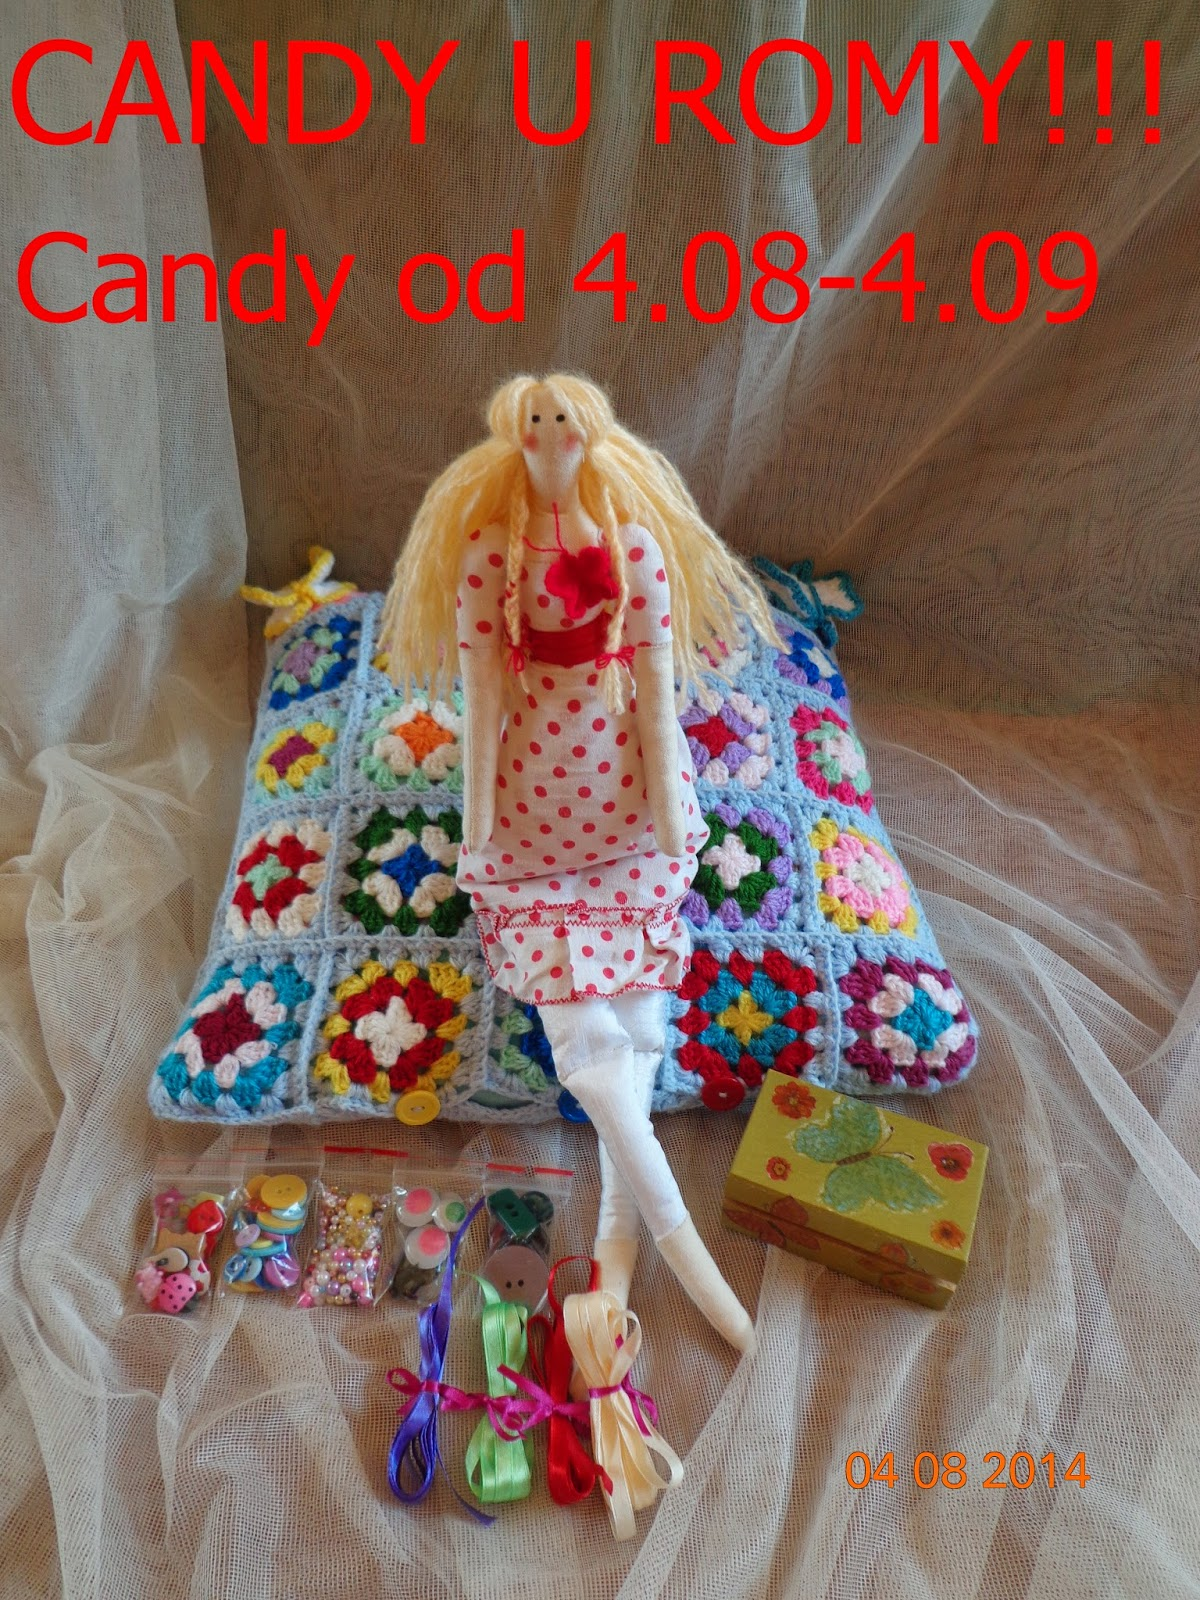 Candy u Romy